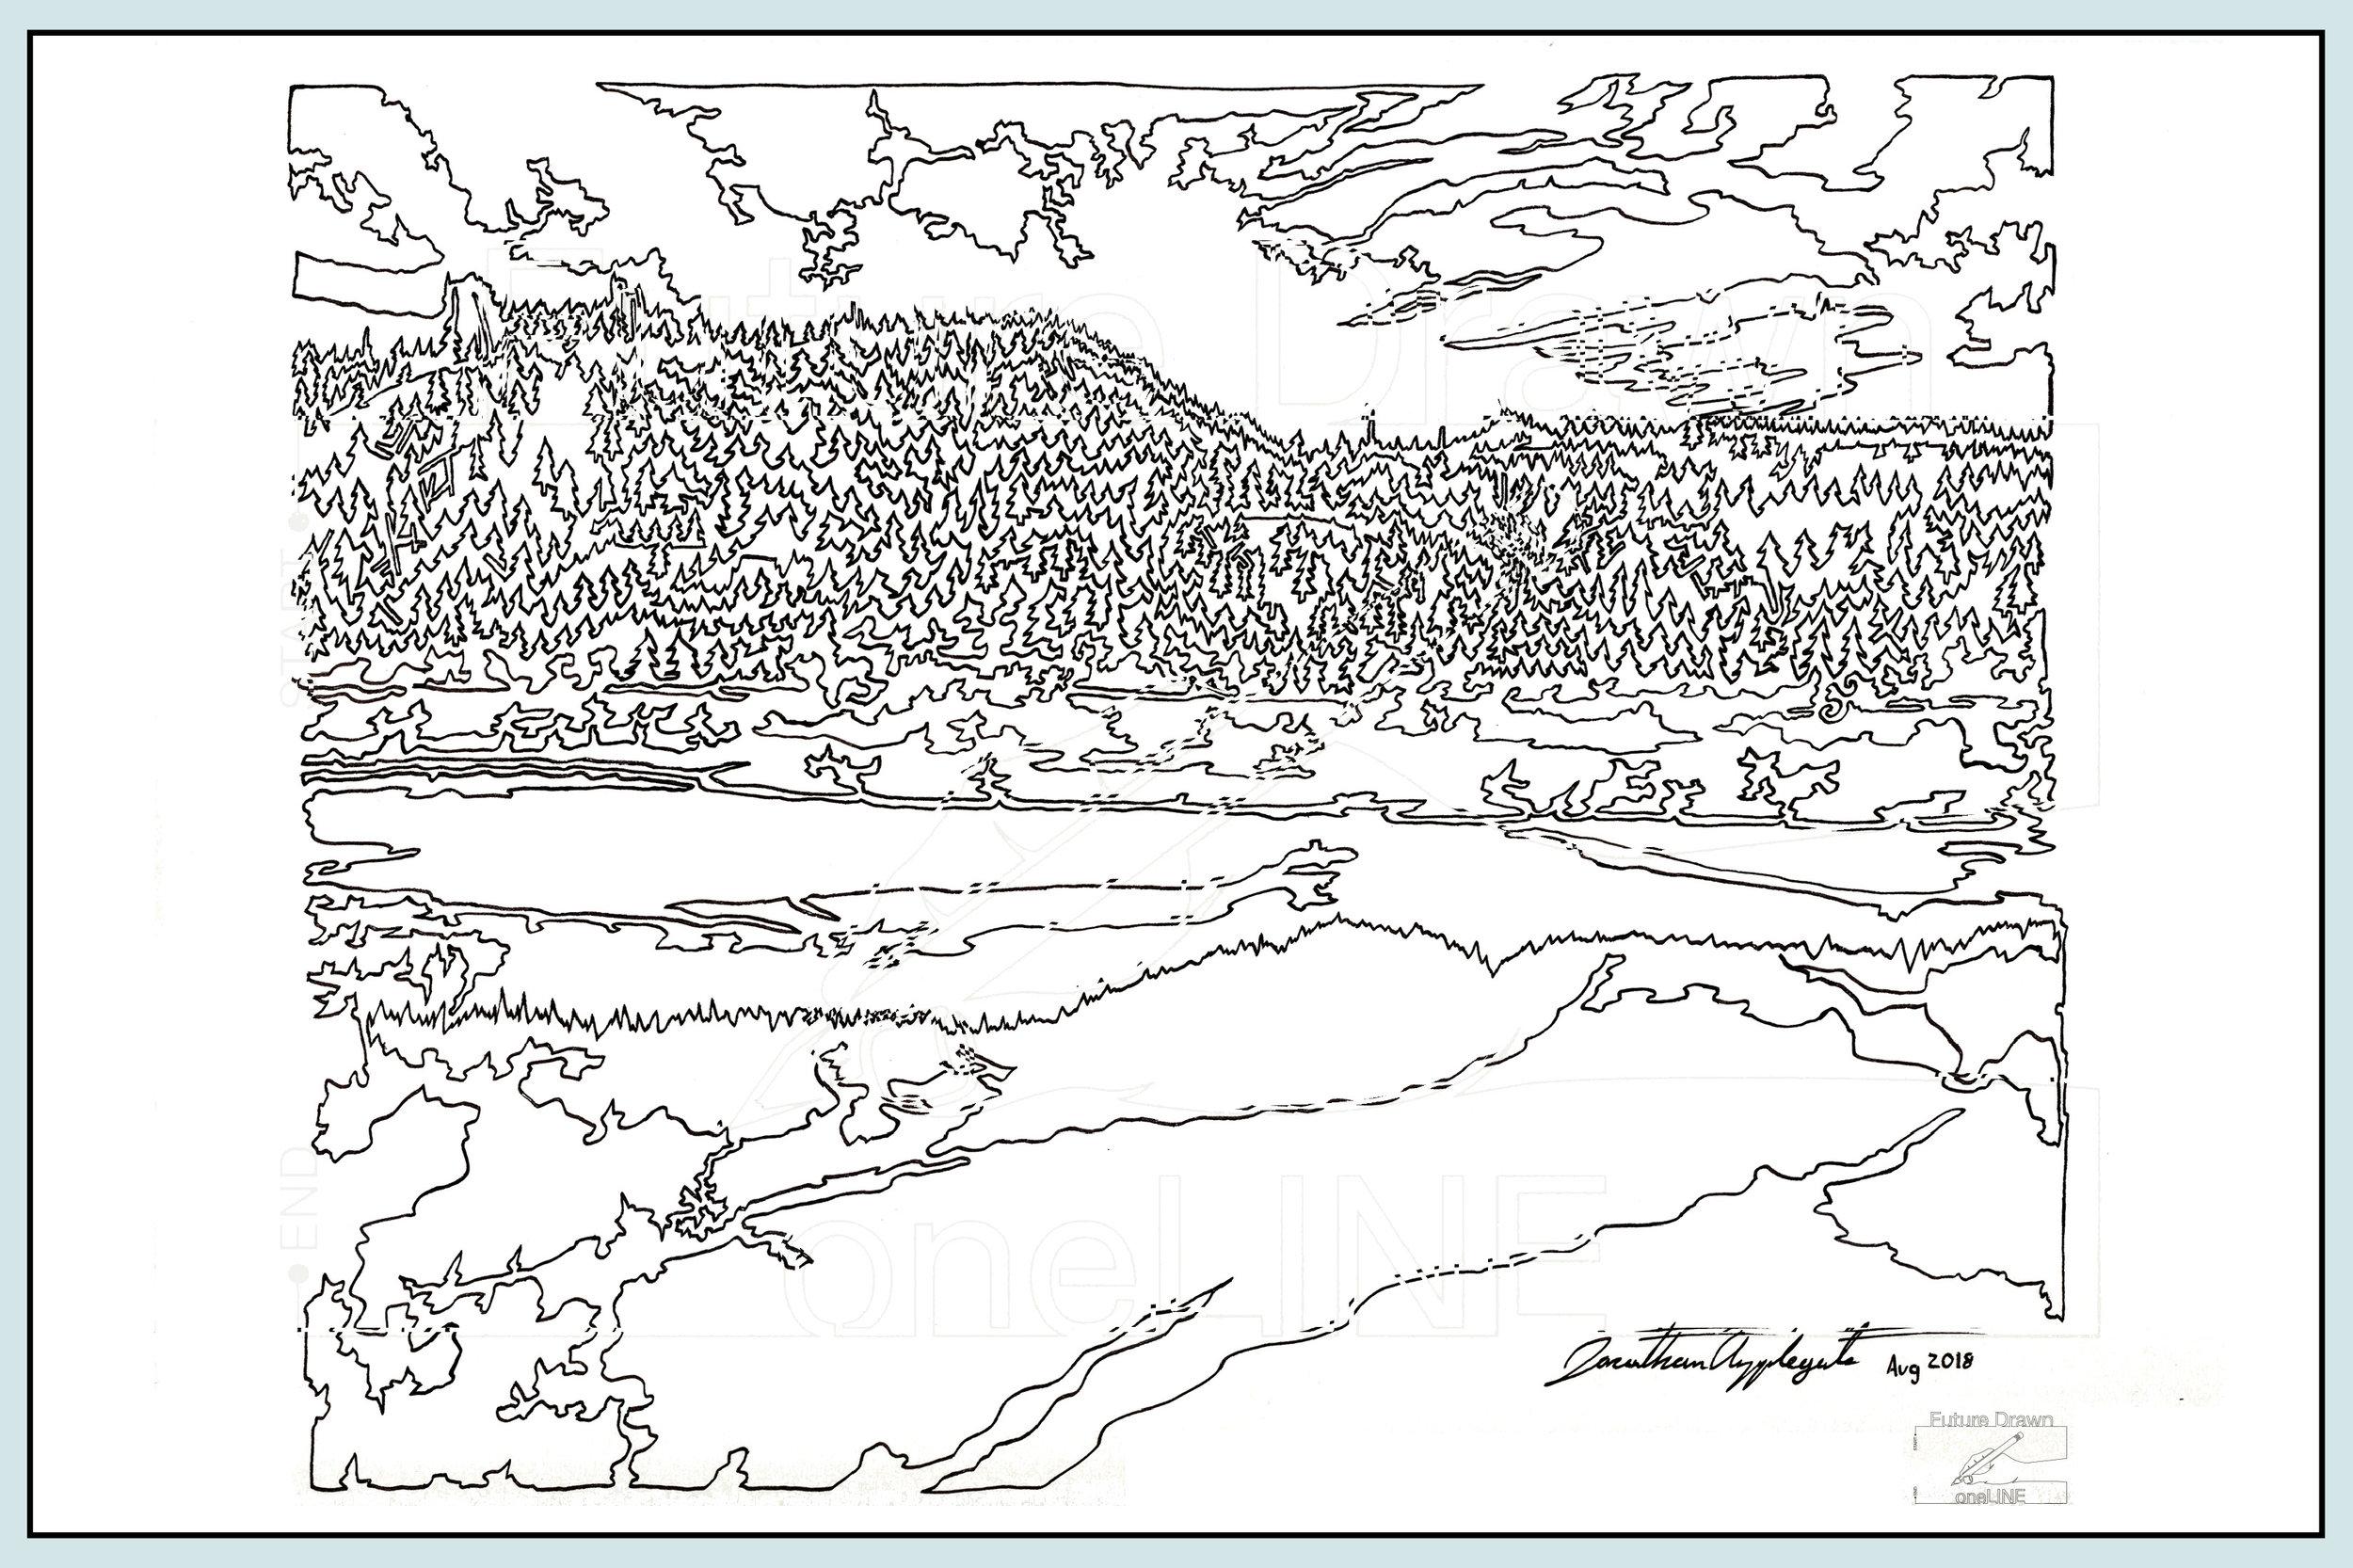 Web- Yellowstone mist- oneLINE Future Drawn Applegate.jpg